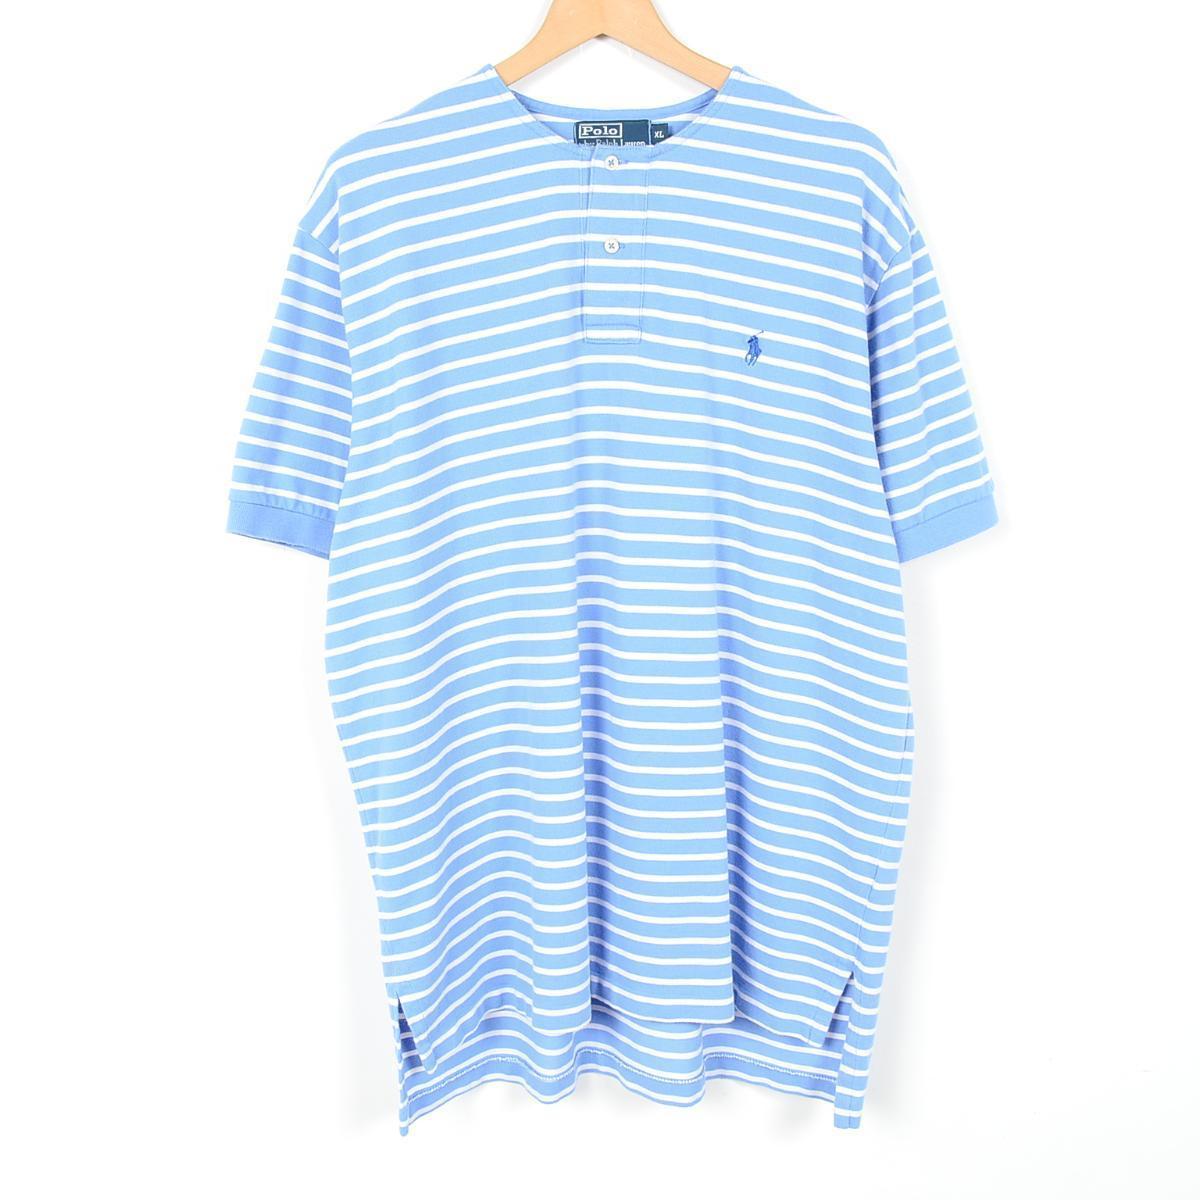 VINTAGE CLOTHING JAM TRADING | Rakuten Global Market: Remake Ralph Lauren POLO by Ralph Lauren border pattern short sleeve now color polo shirt Mens XL ...